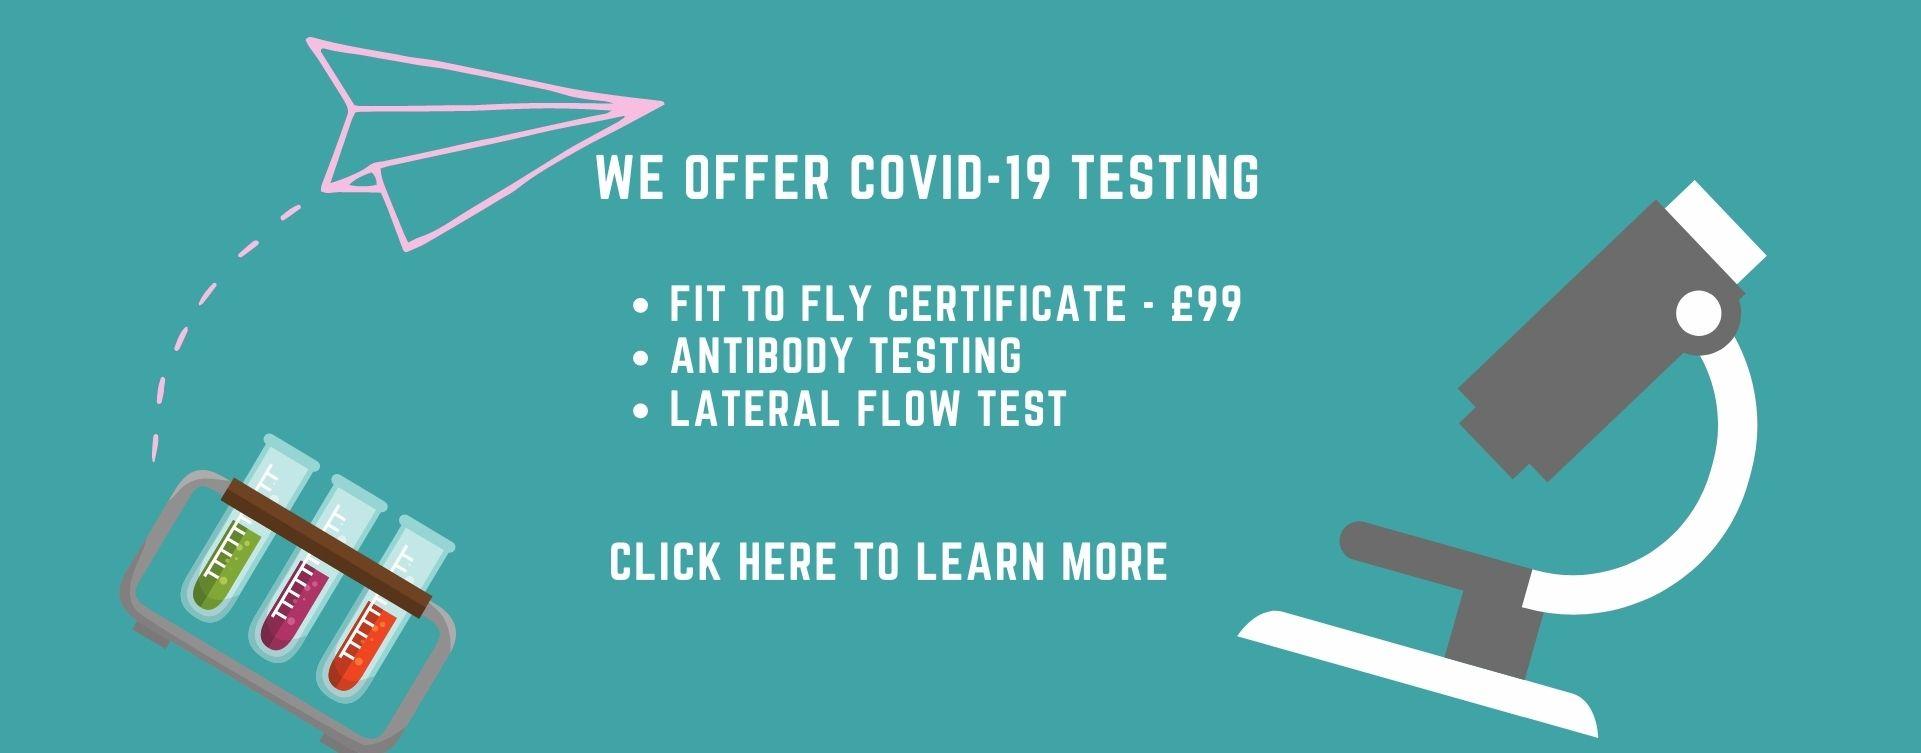 COVID-19 Covid Testing Hampstead